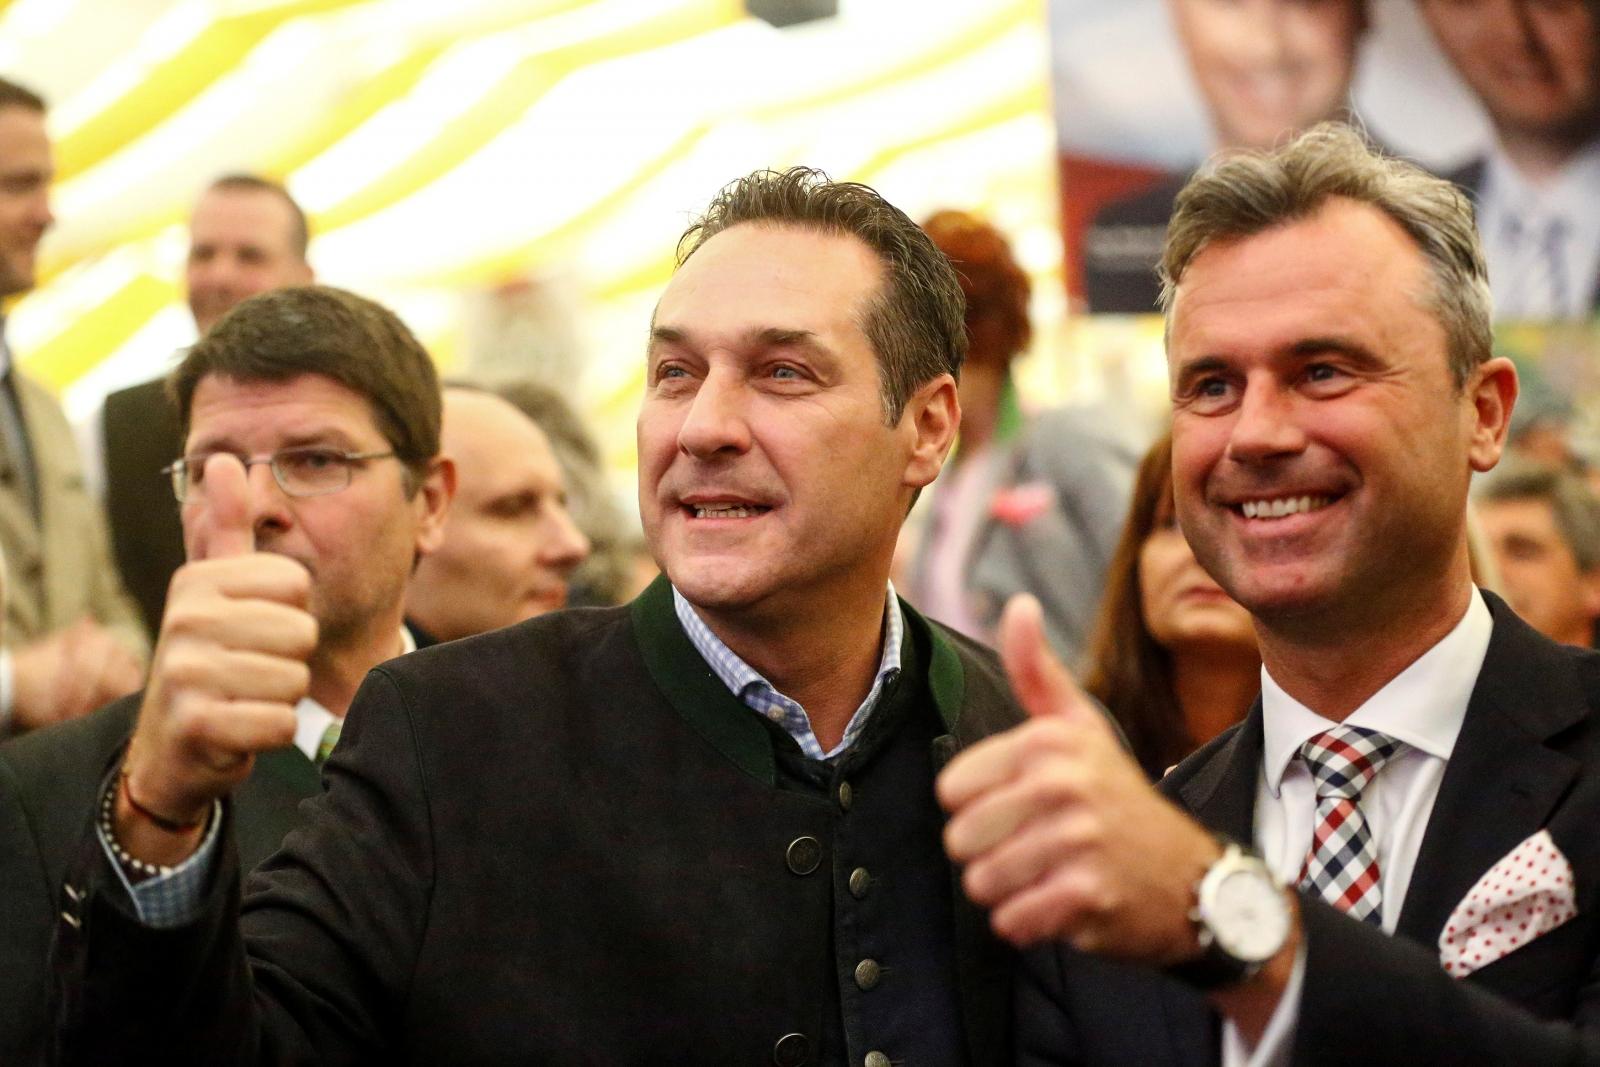 Austrian election rally